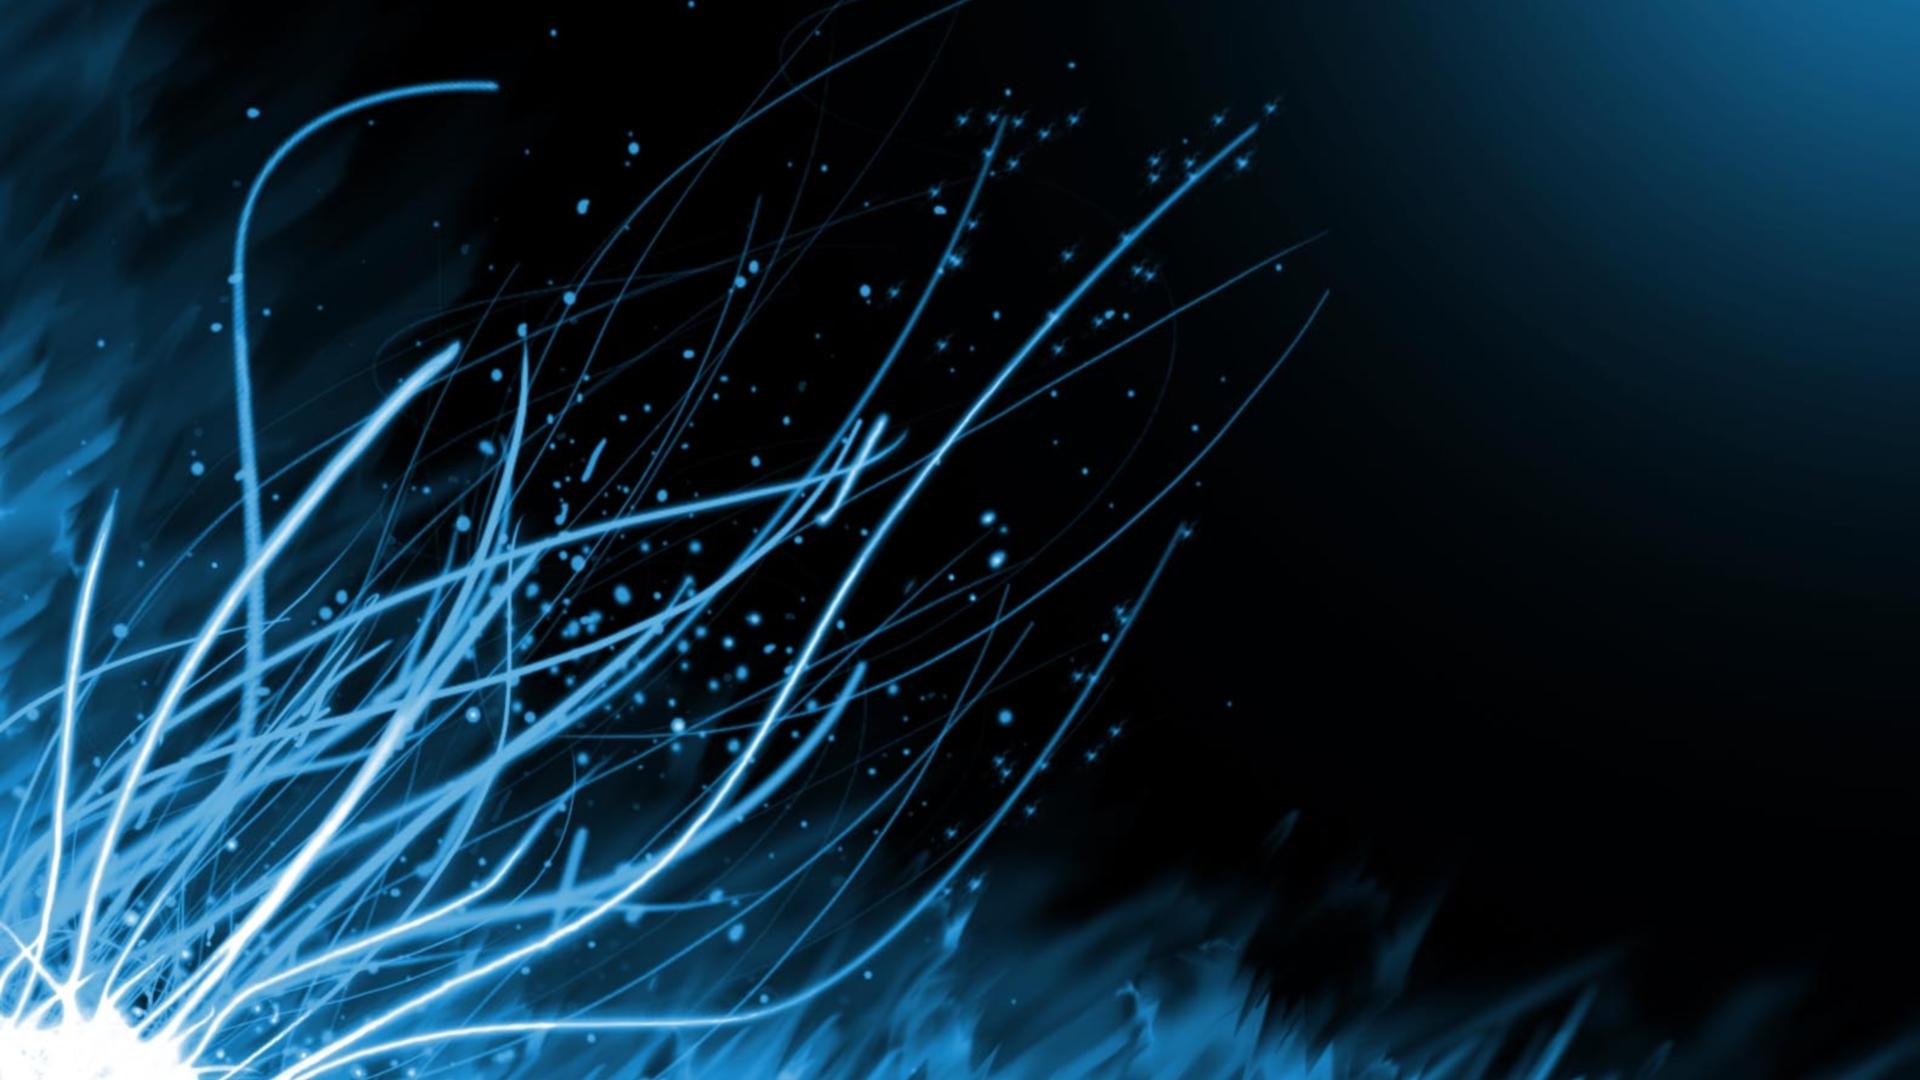 Light Blue Abstract Wallpaper Abstract Wallpaper Hd